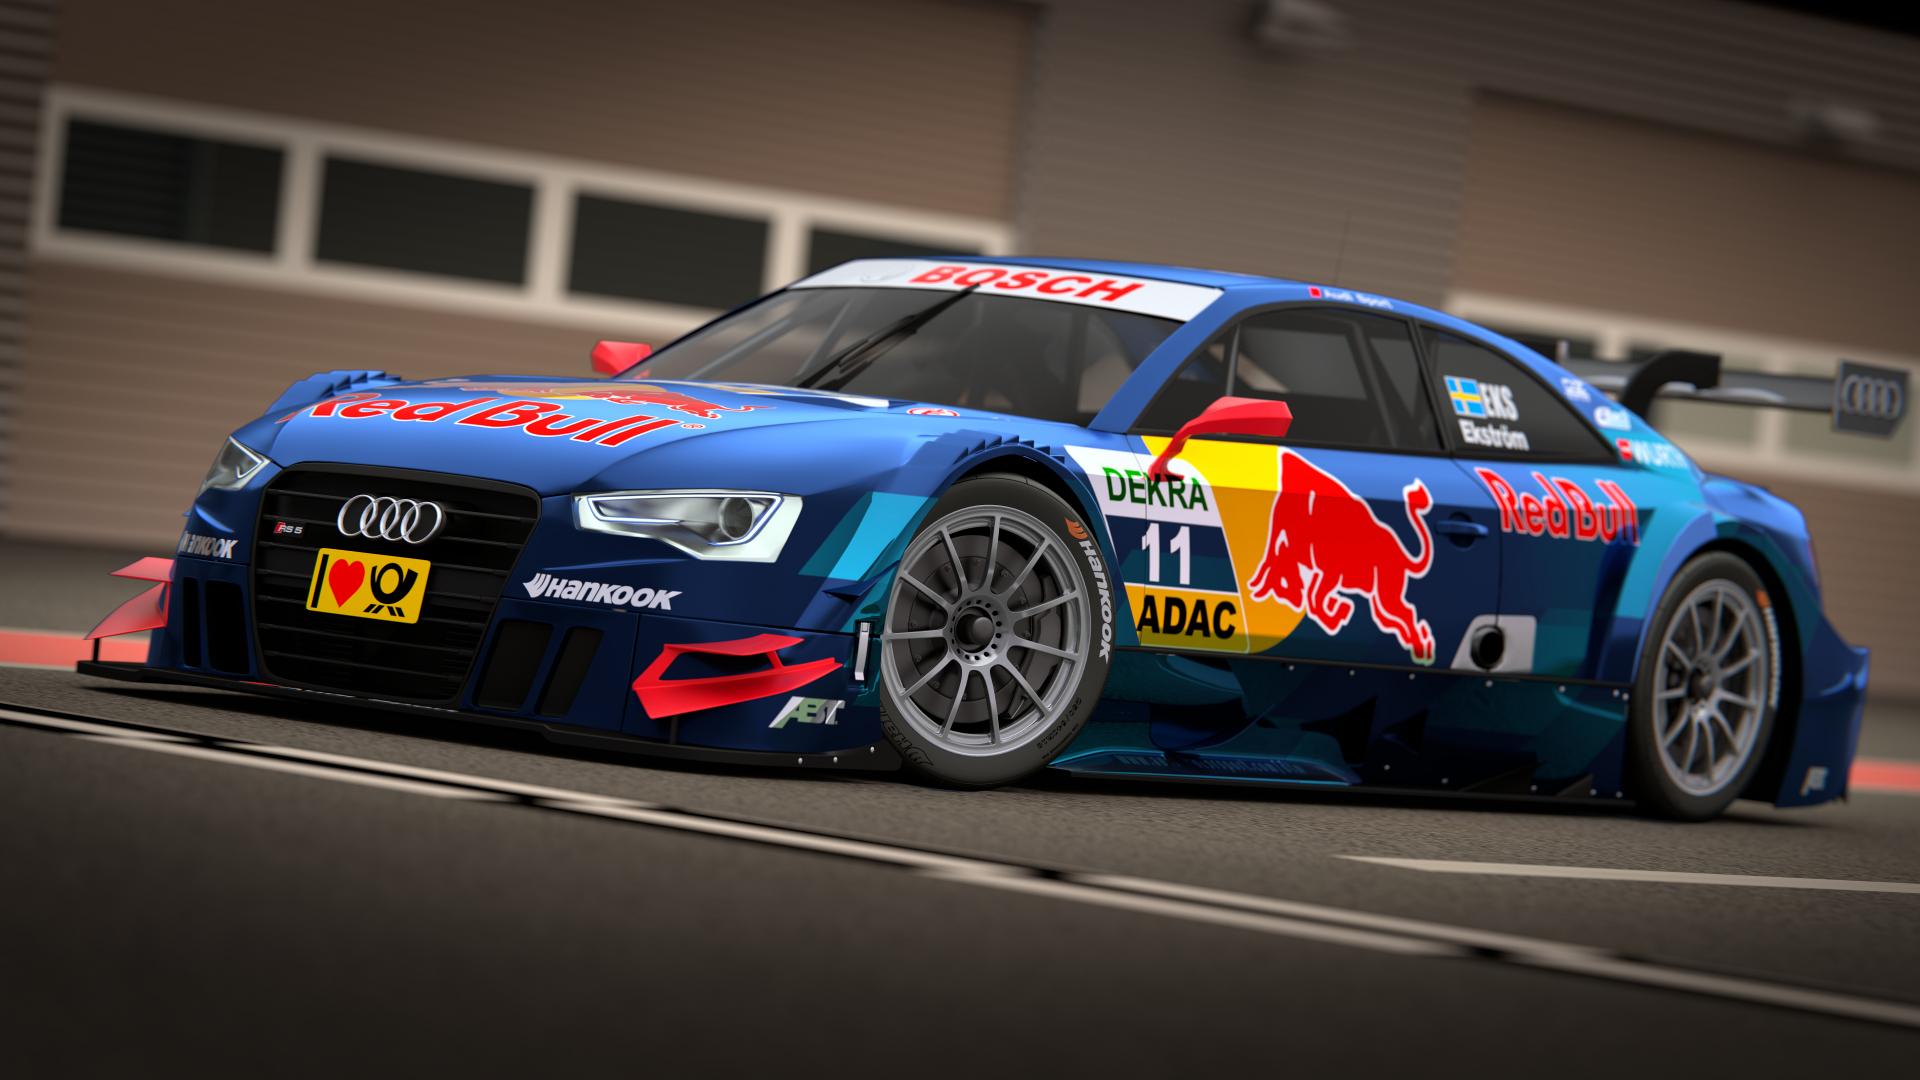 Audi RS5 2013 3d art